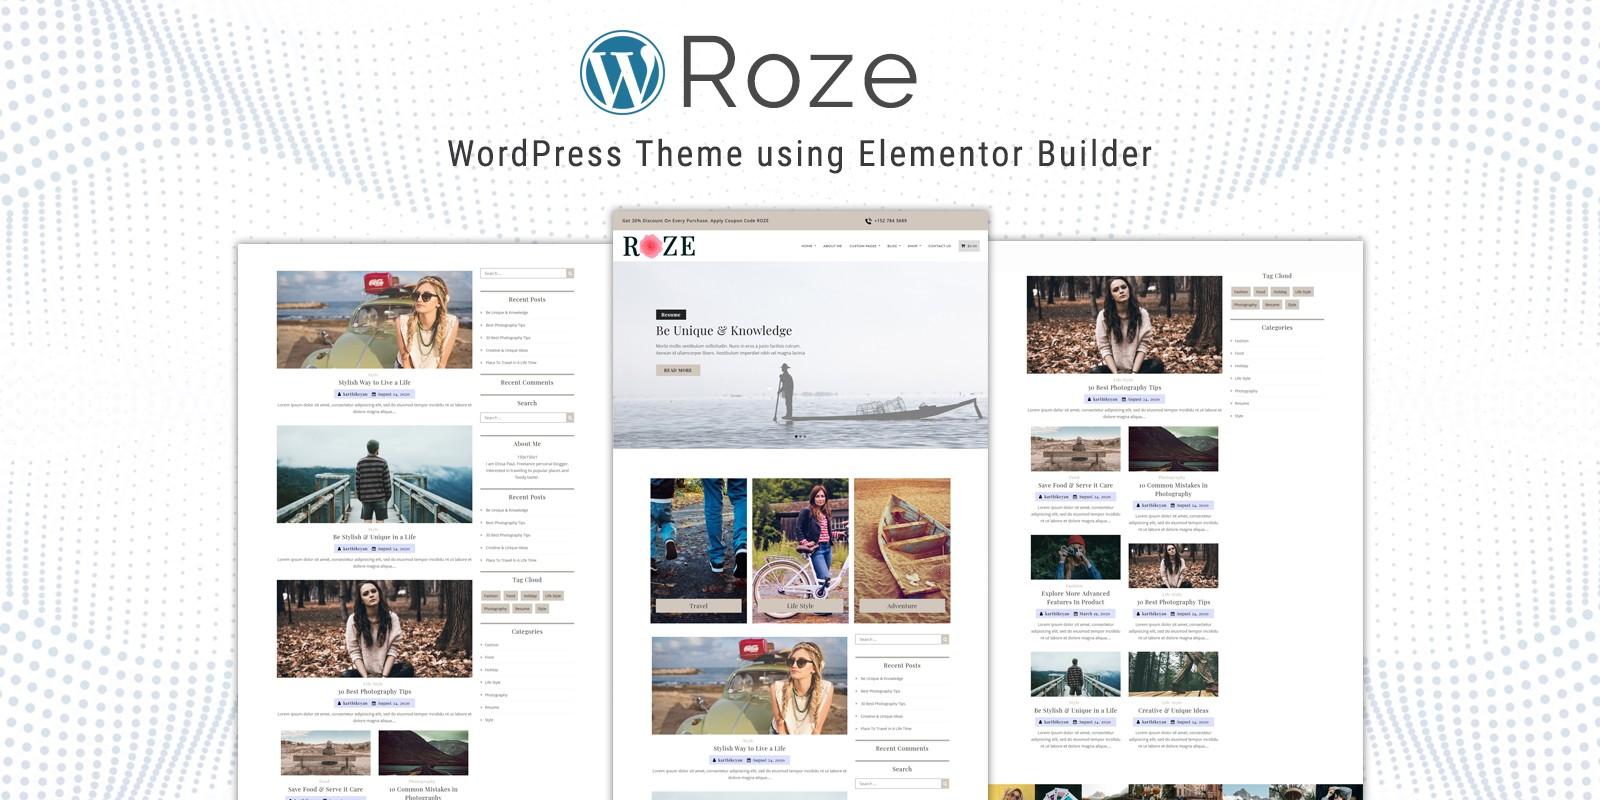 Roze - WordPress Theme using Elementor Builder